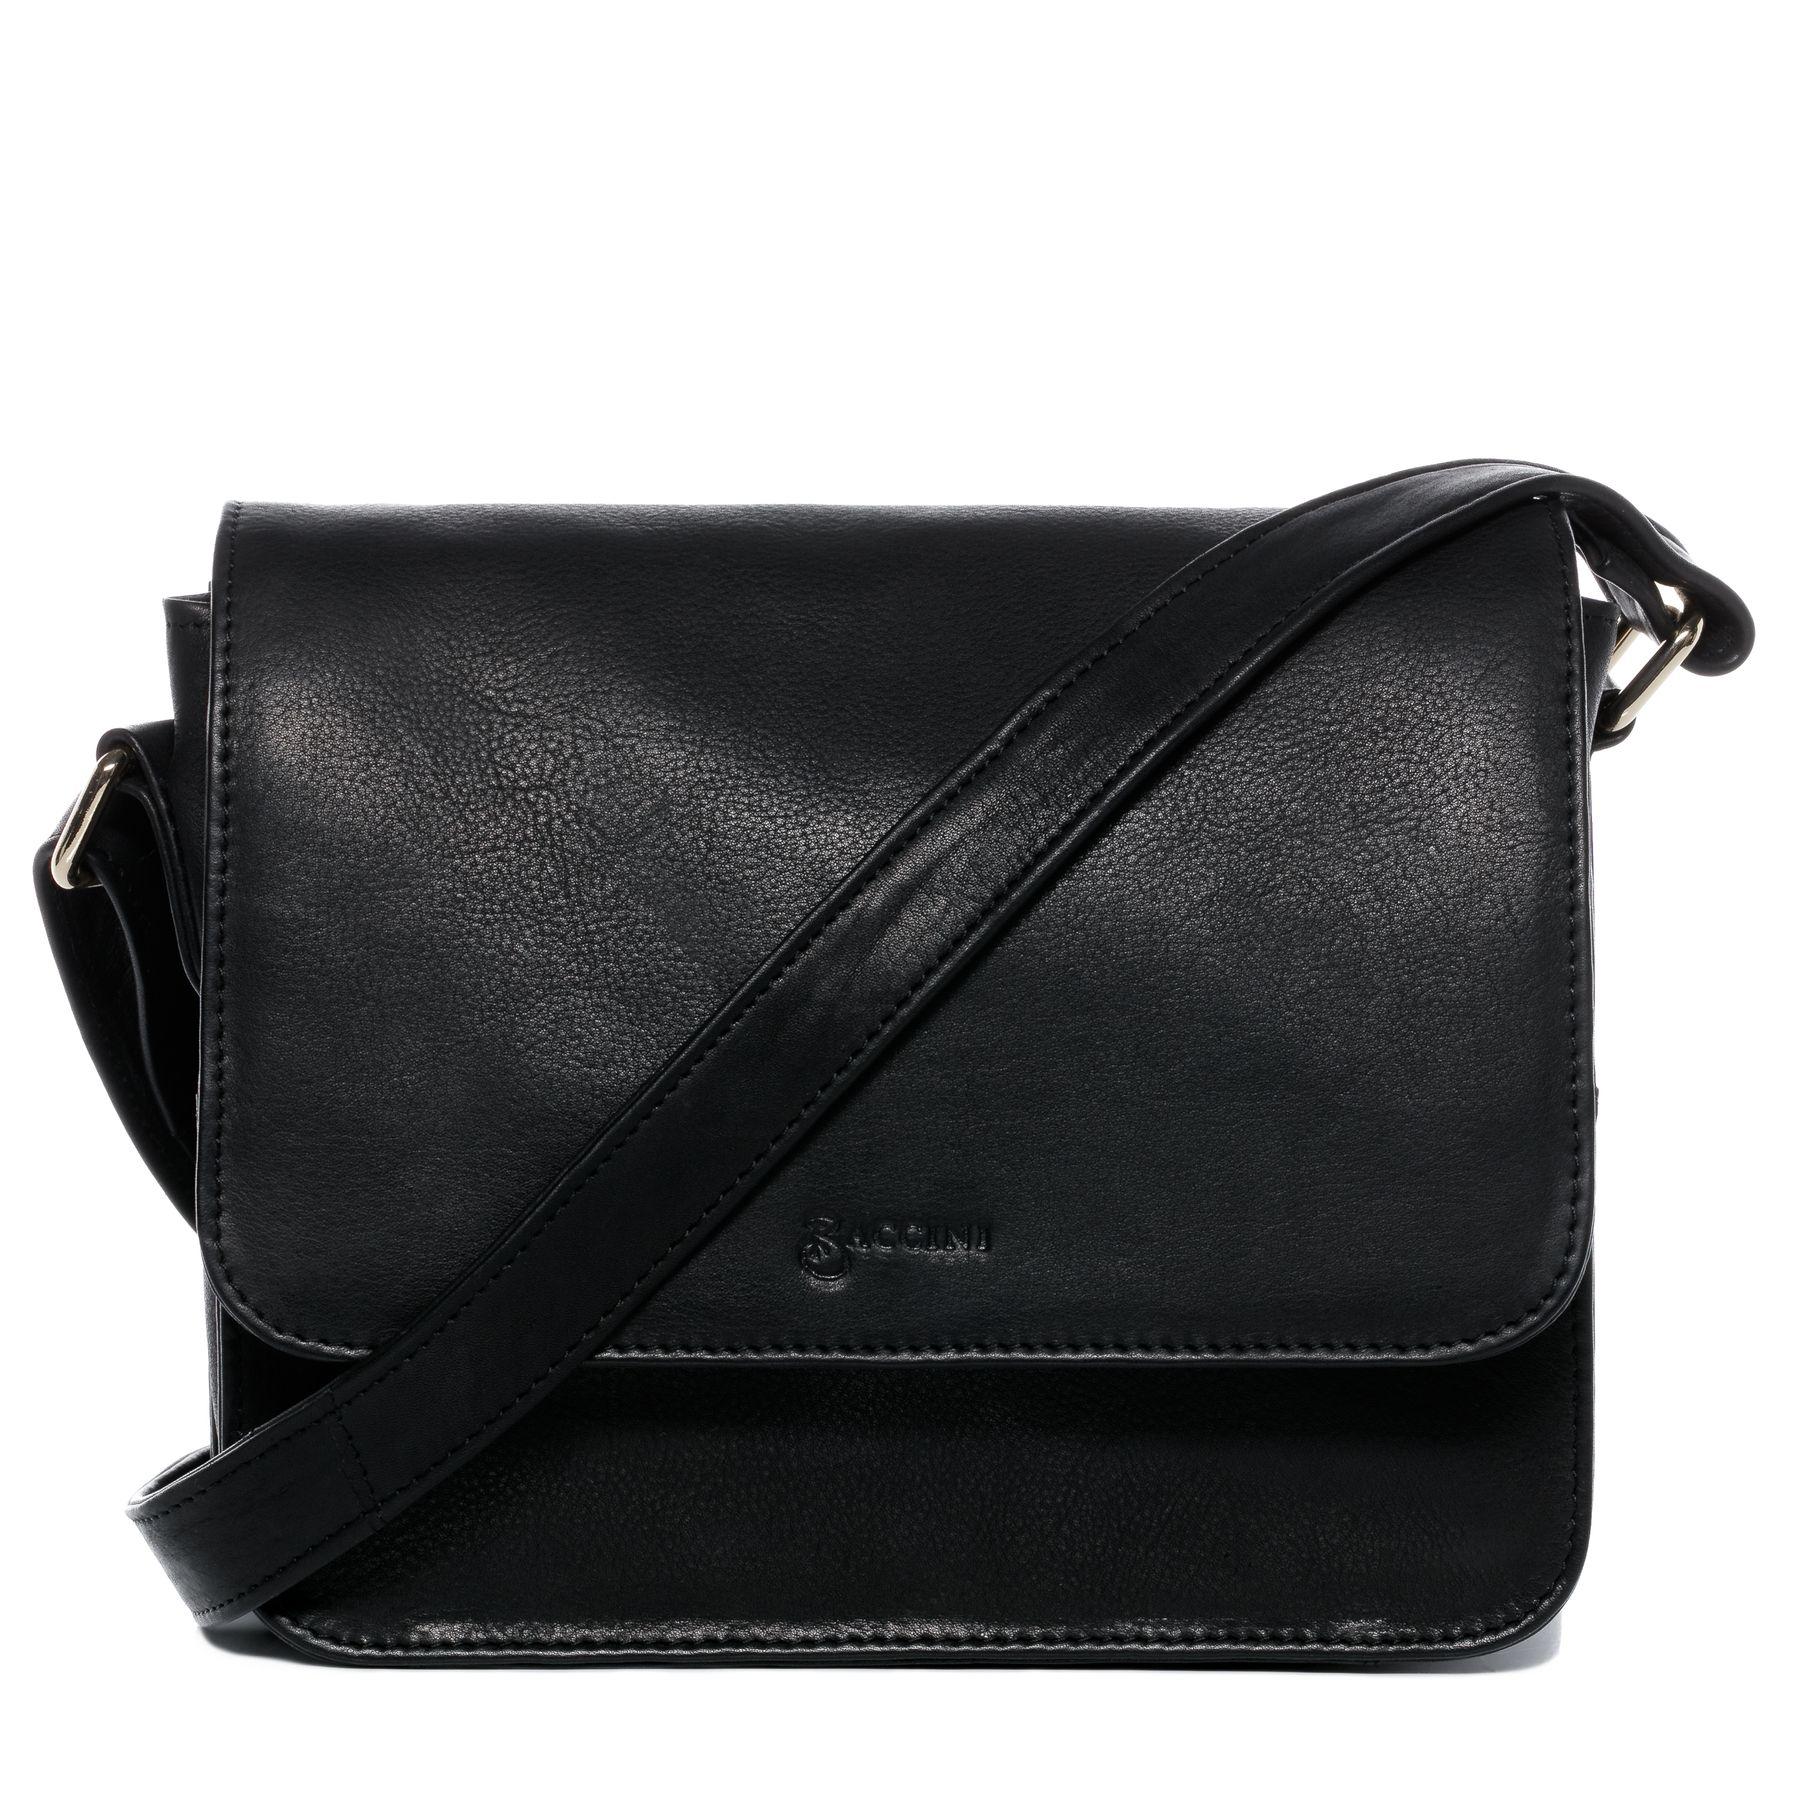 10f1765449c BACCINI shoulder bag & cross-body bag Nappa Leather EMMA black tote ...